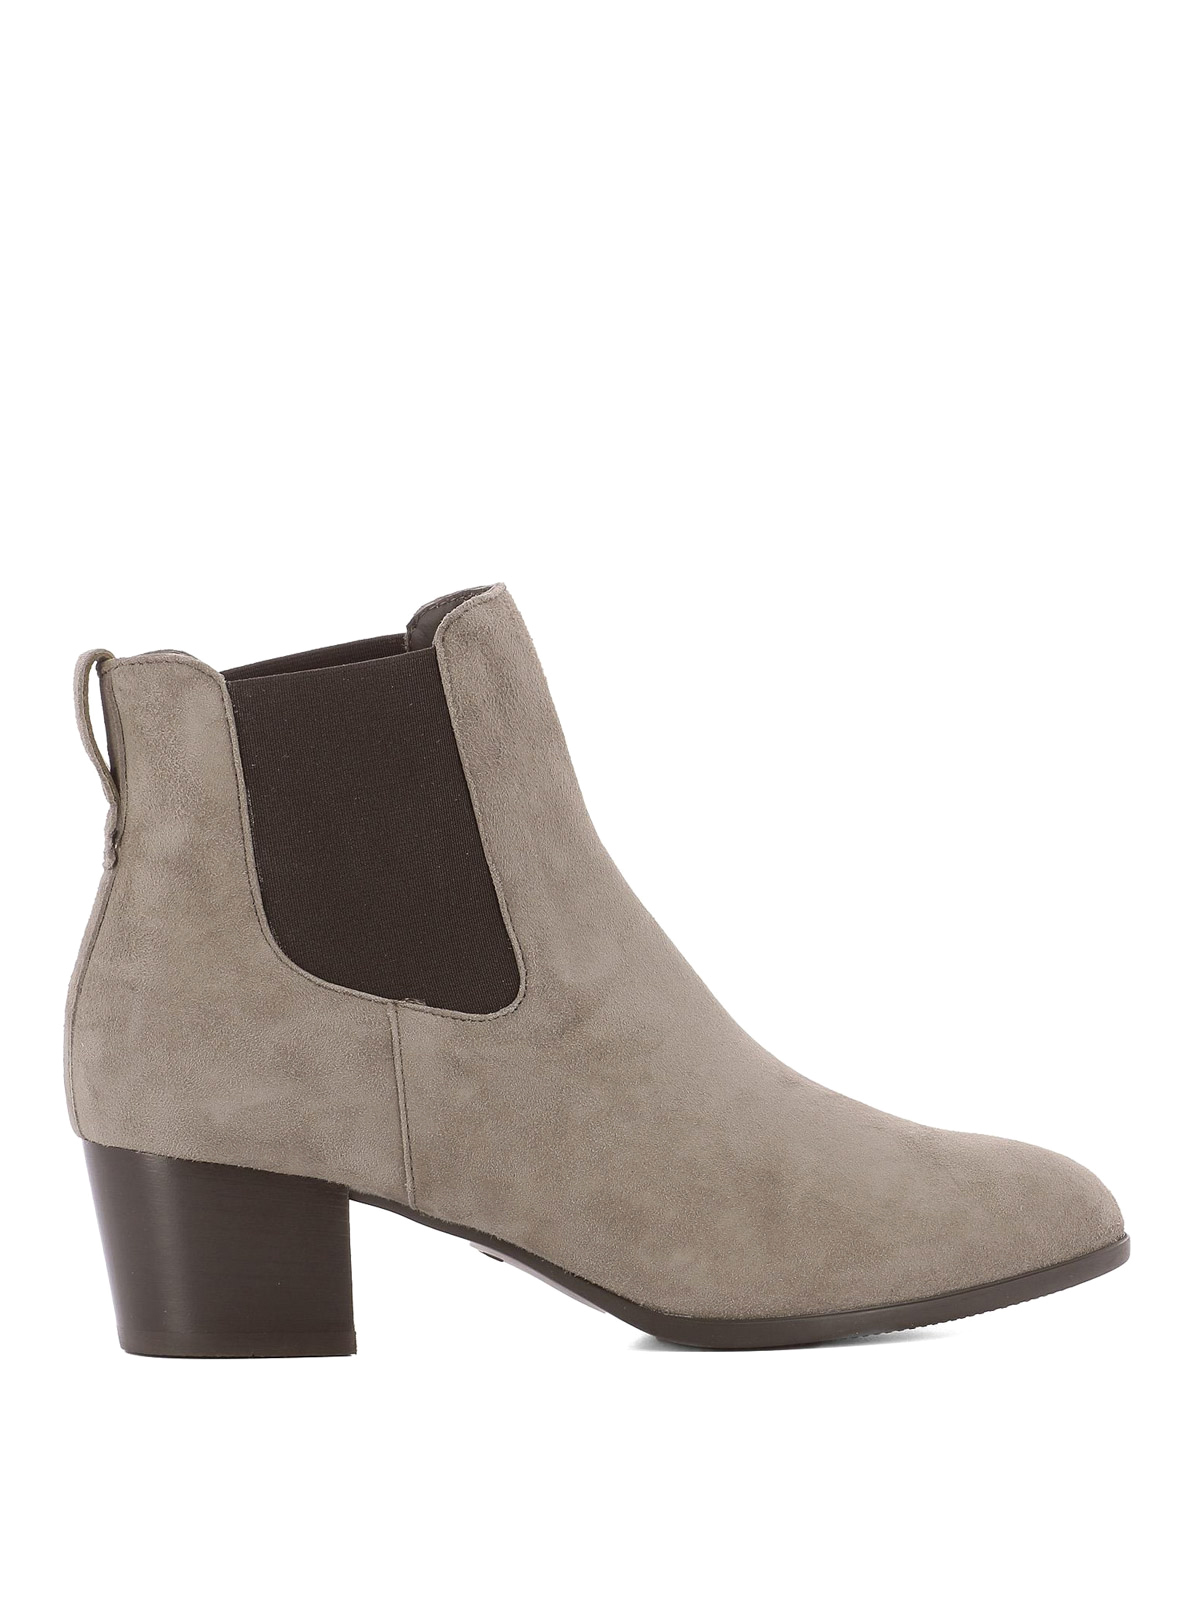 h314 beige suede chelsea boots by hogan ankle boots ikrix. Black Bedroom Furniture Sets. Home Design Ideas